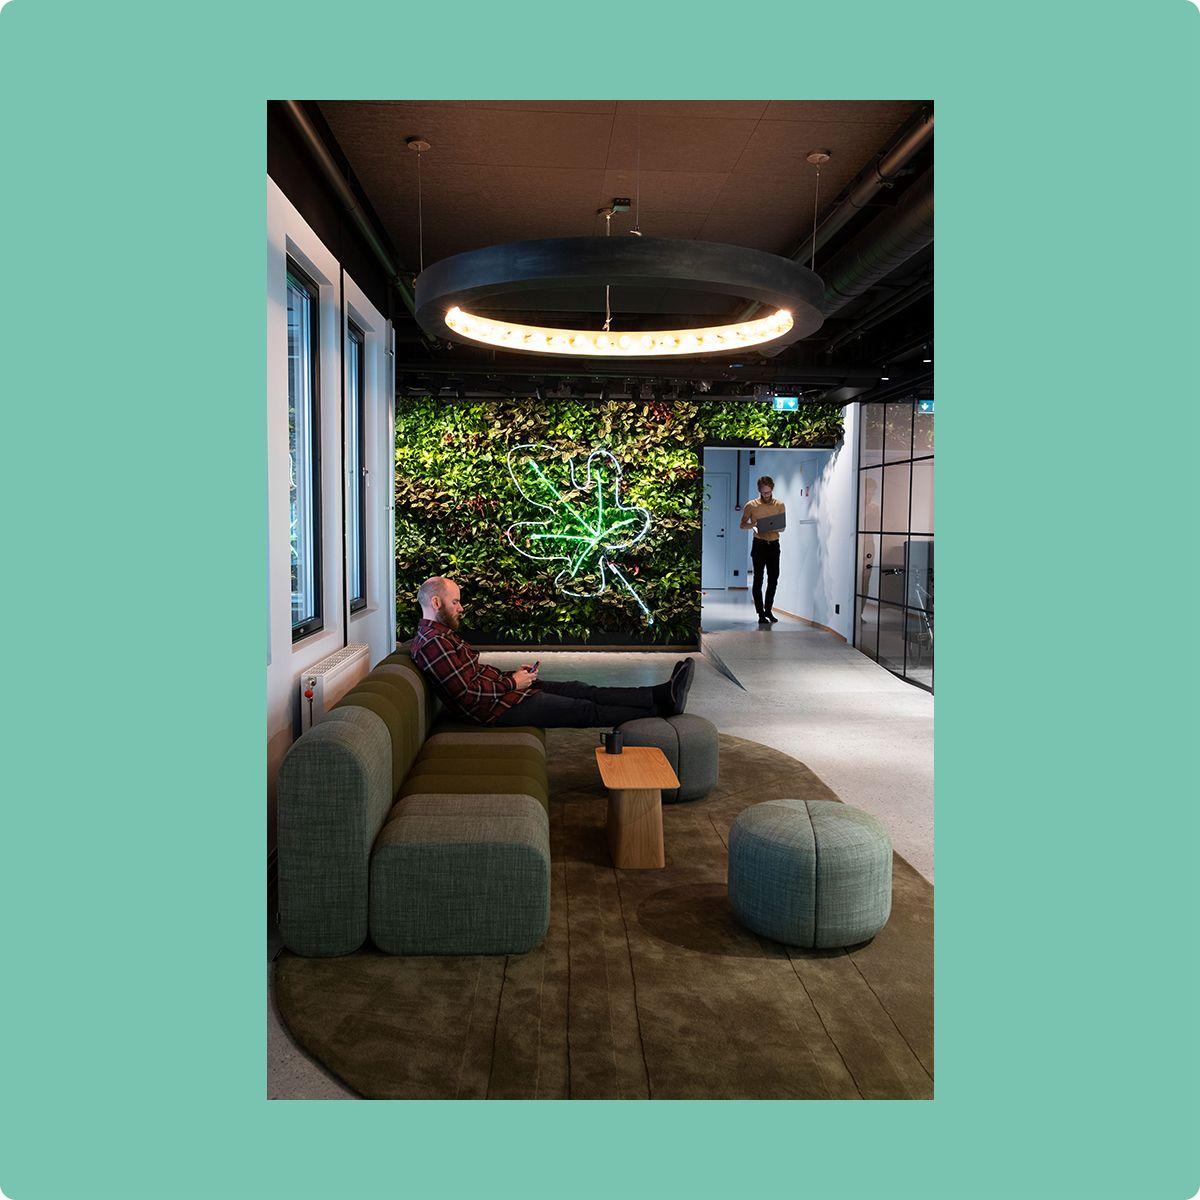 Fotografi som viser to personer på et kontor med et fikenblad på veggen